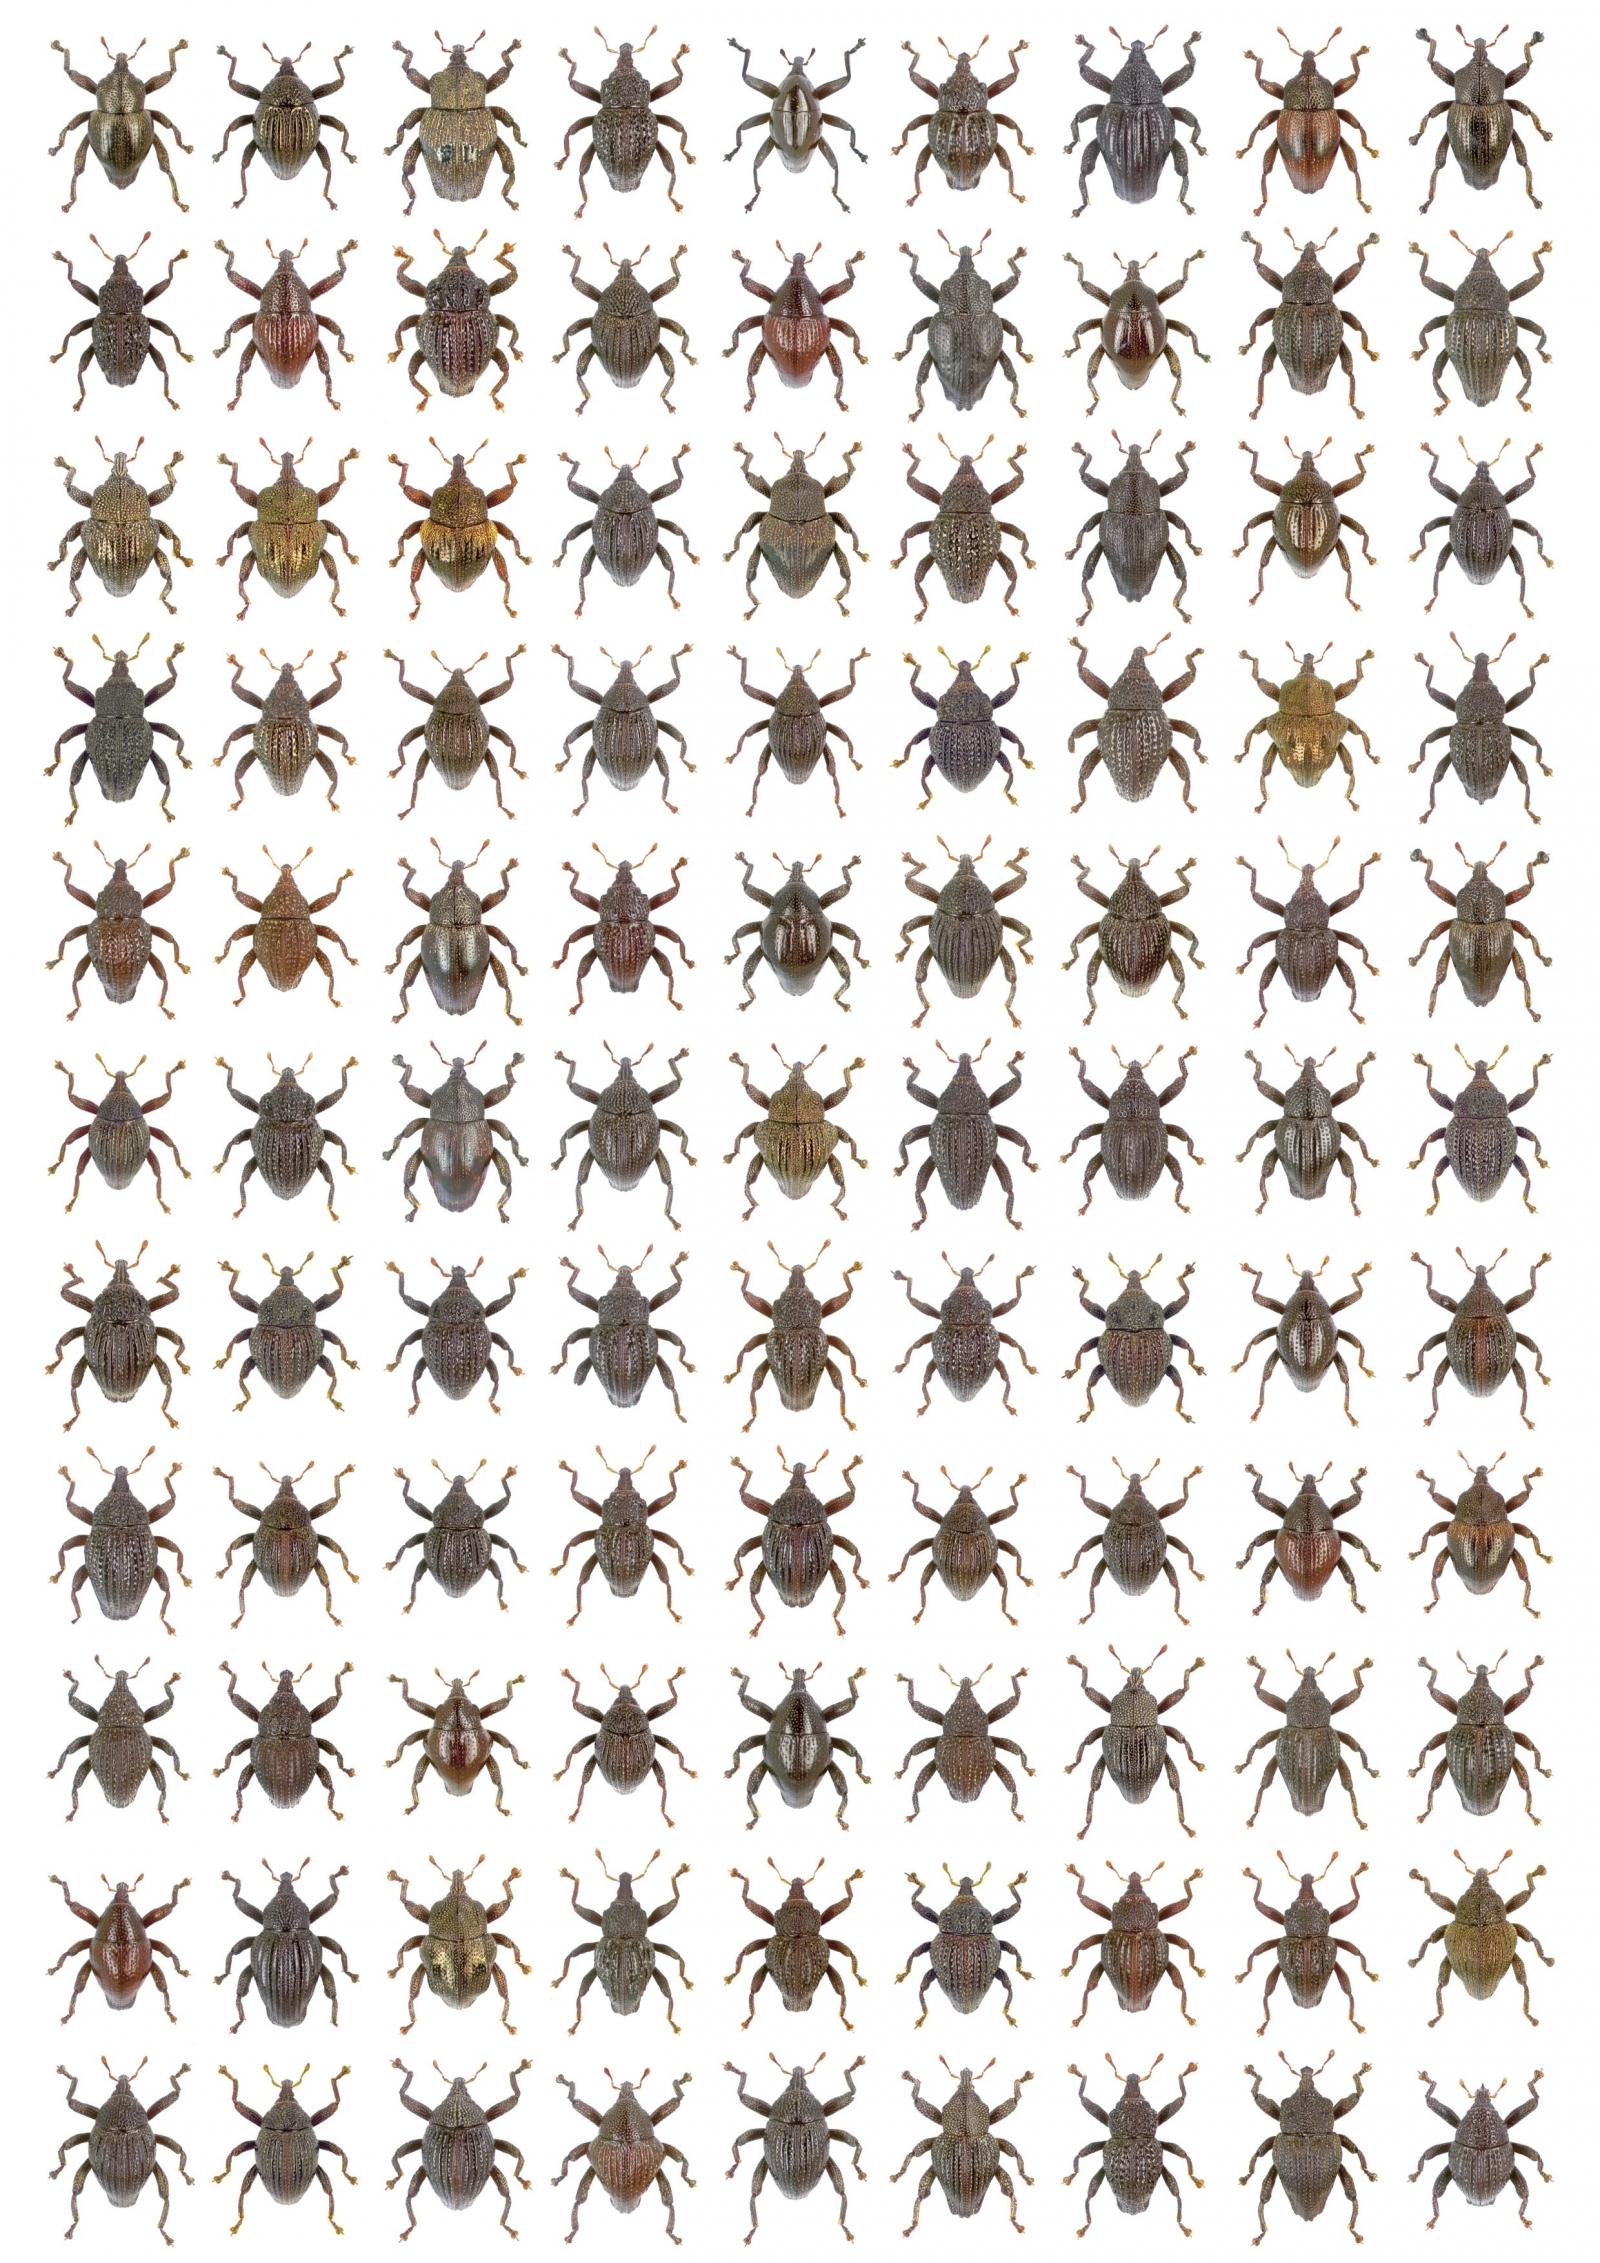 david attenborough beetle